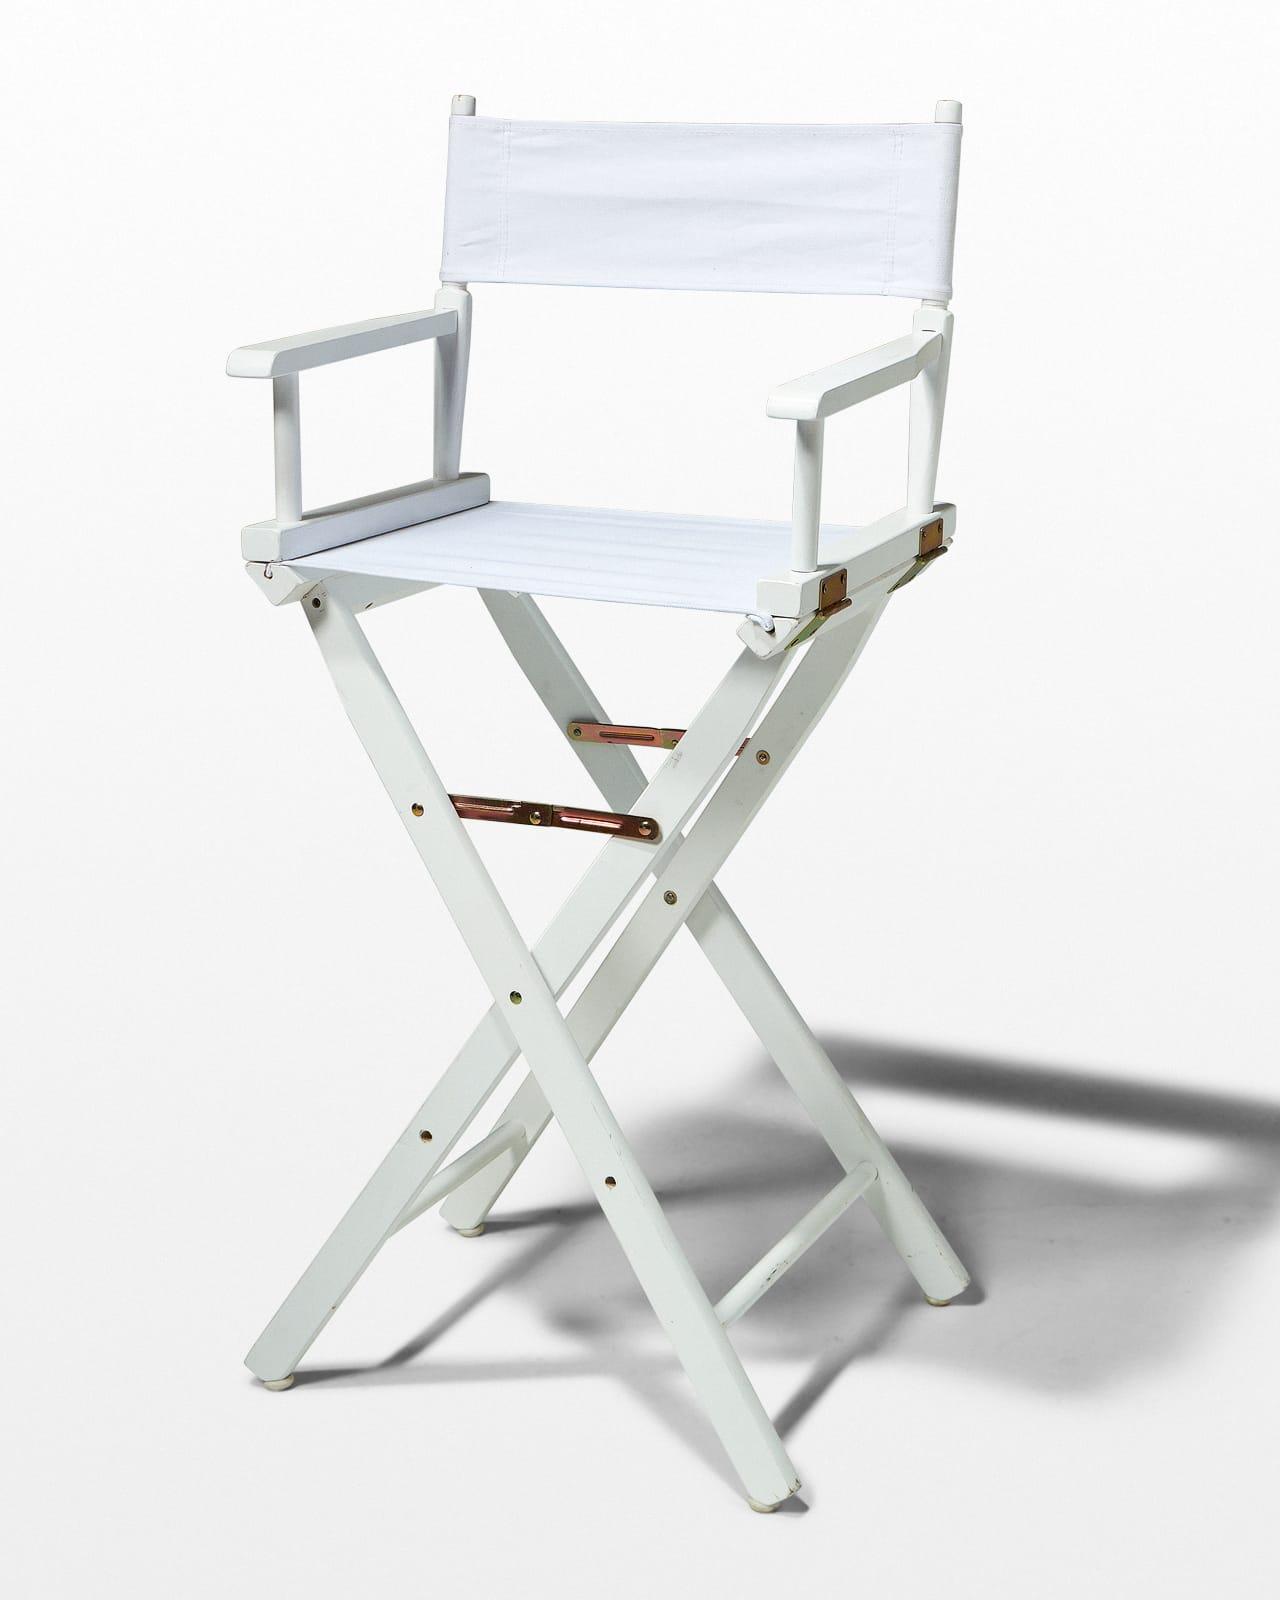 directors chair white yogibo bean bag ch110 plain prop rental acme brooklyn front view of